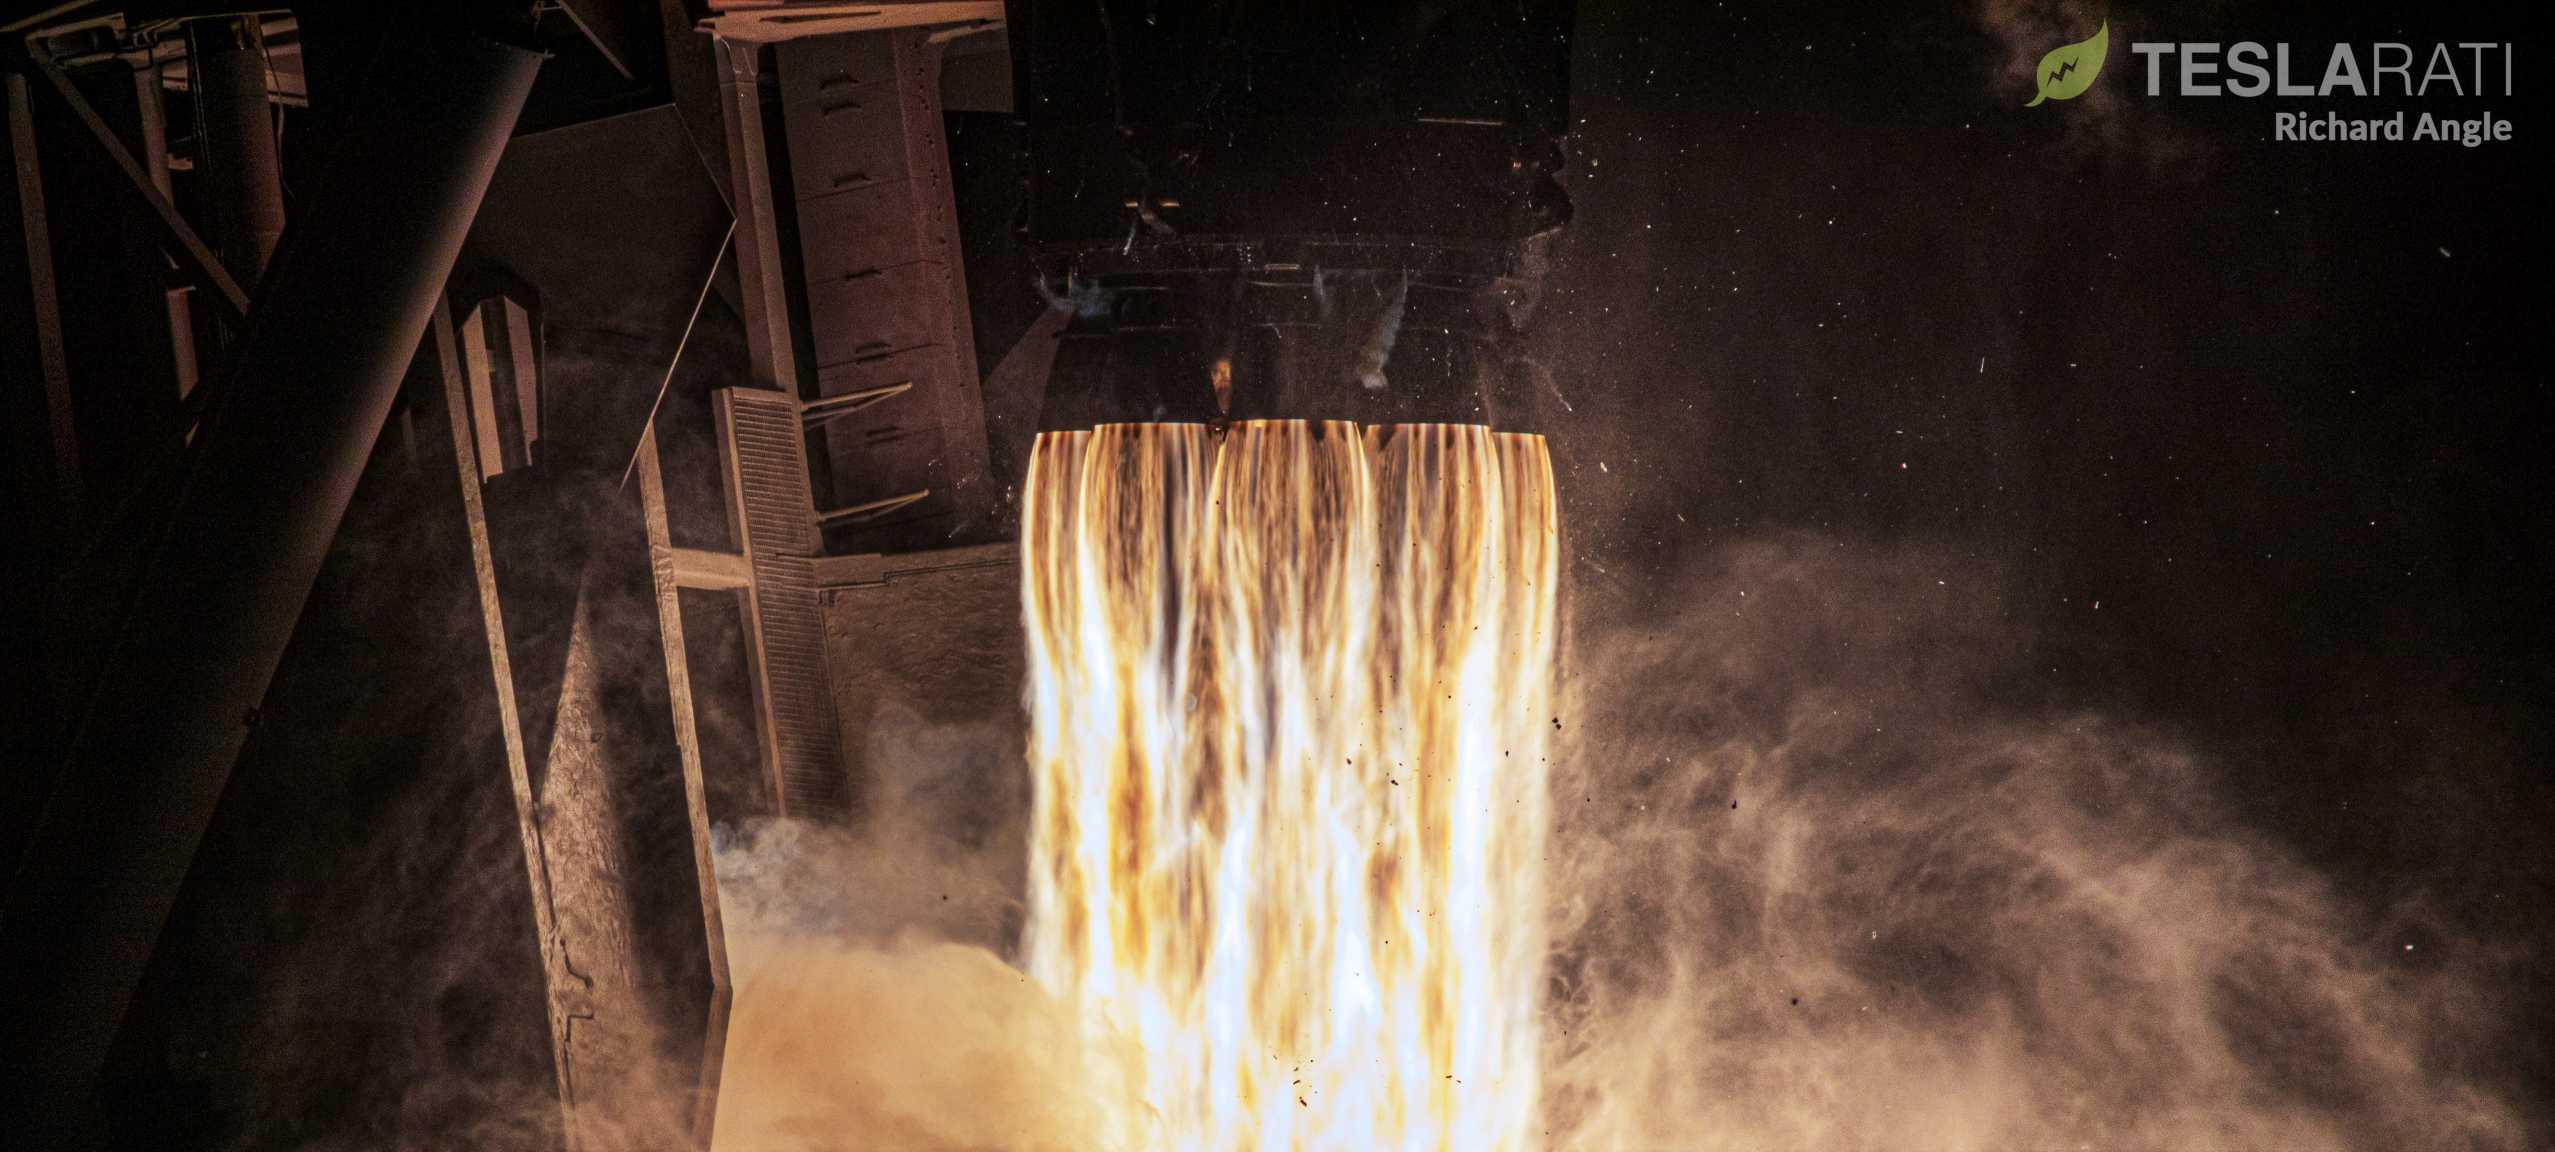 Starlink-8 Falcon 9 B1049 LC-40 060320 (Richard Angle) launch 3 edit 1 (c)